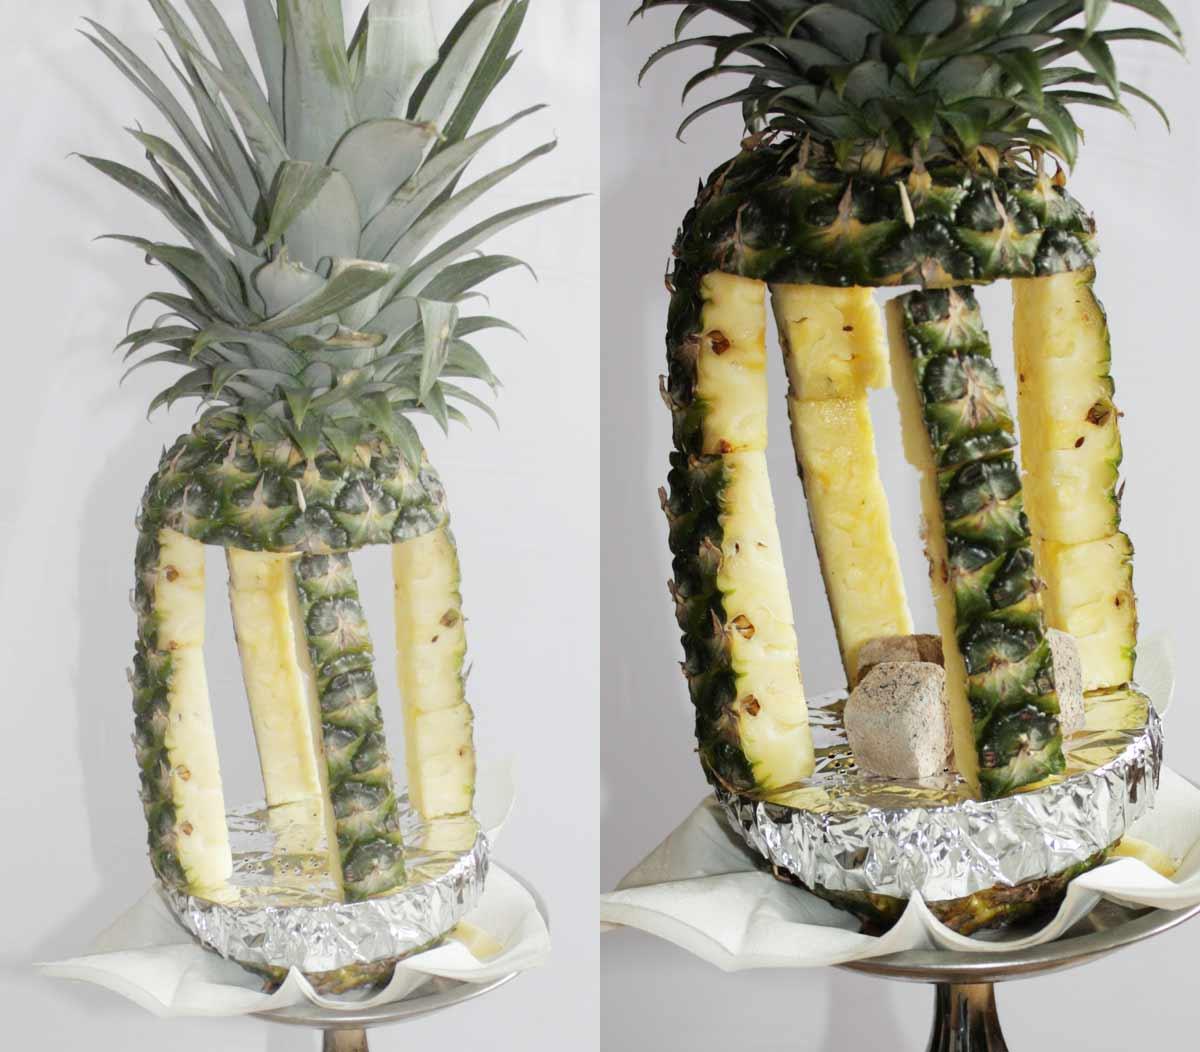 Fruchtkopf Ananas auf der Shisha